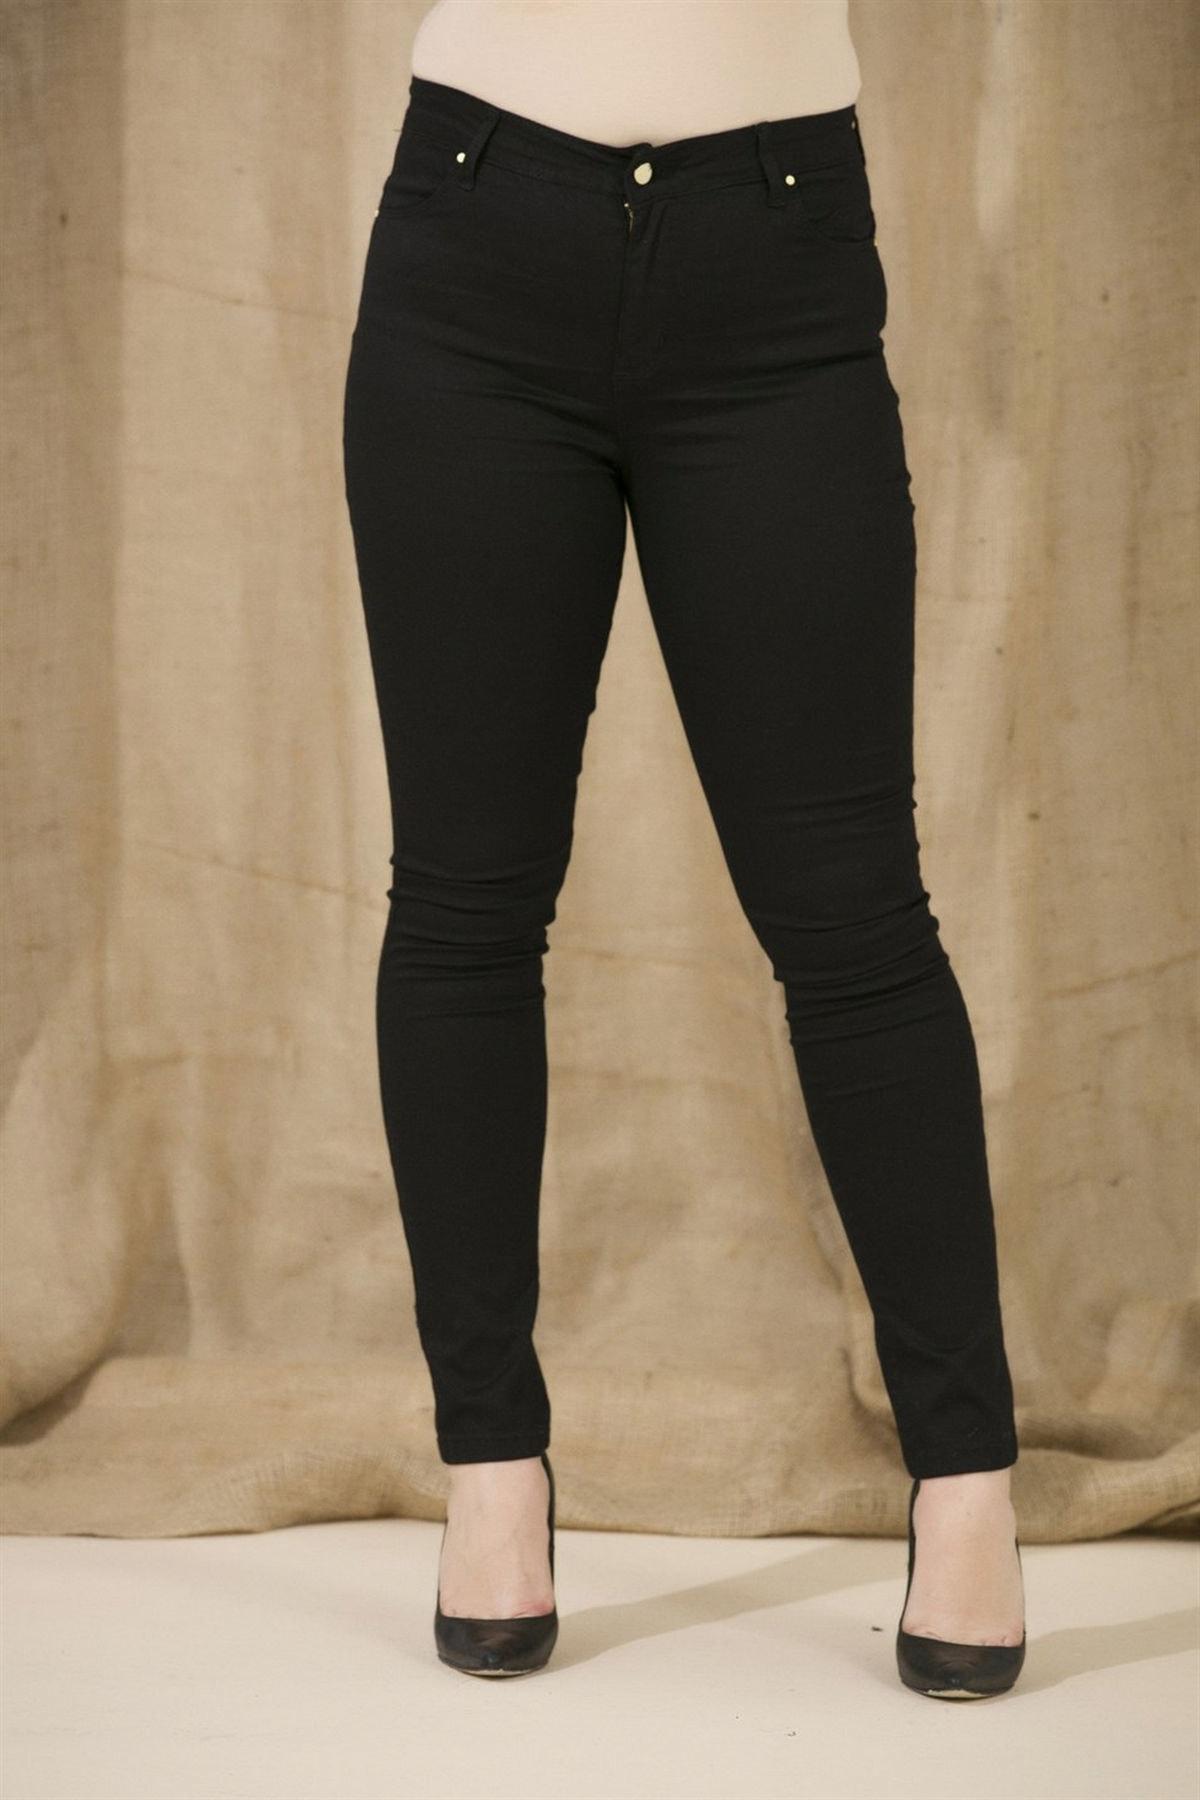 Kadın Siyah Kanvas Yüksek Bel Dar Paça Pantolon  Rg1239pb